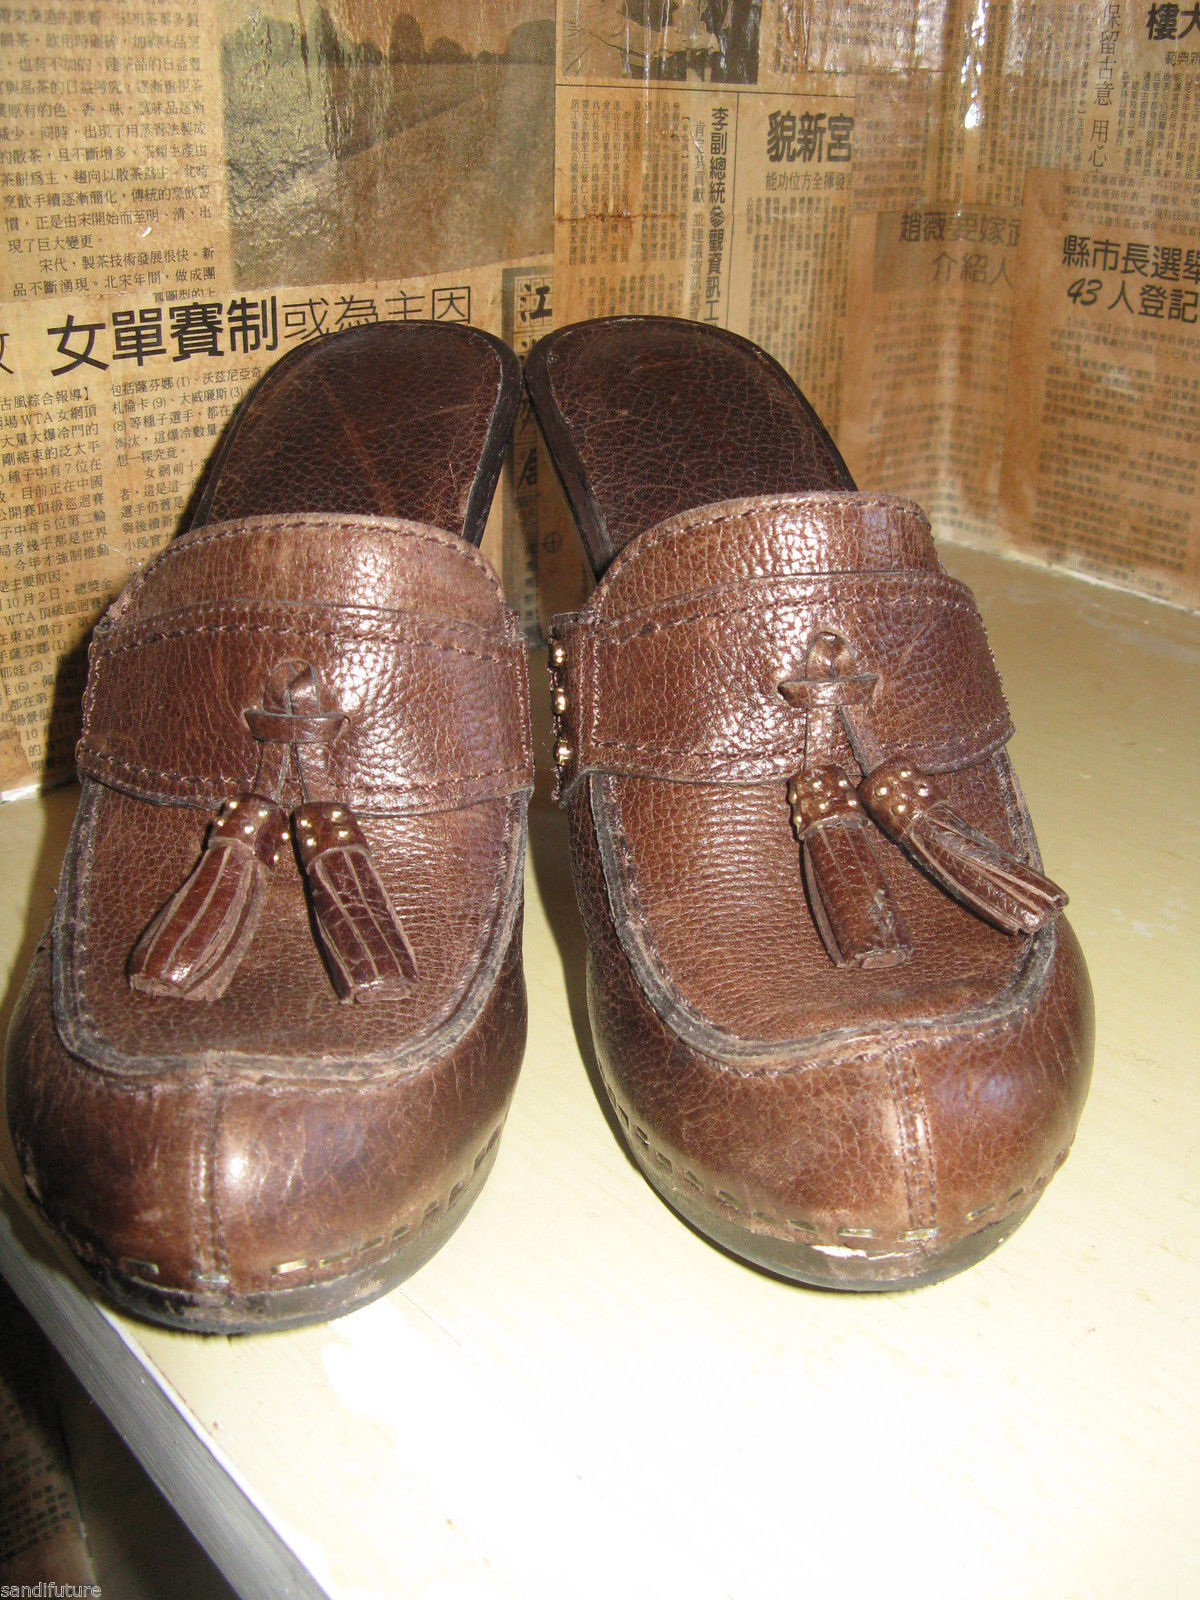 Michael Kors San Antonio platform clog mule wooden tassel shoes 6.5 UK4 36.5 image 2